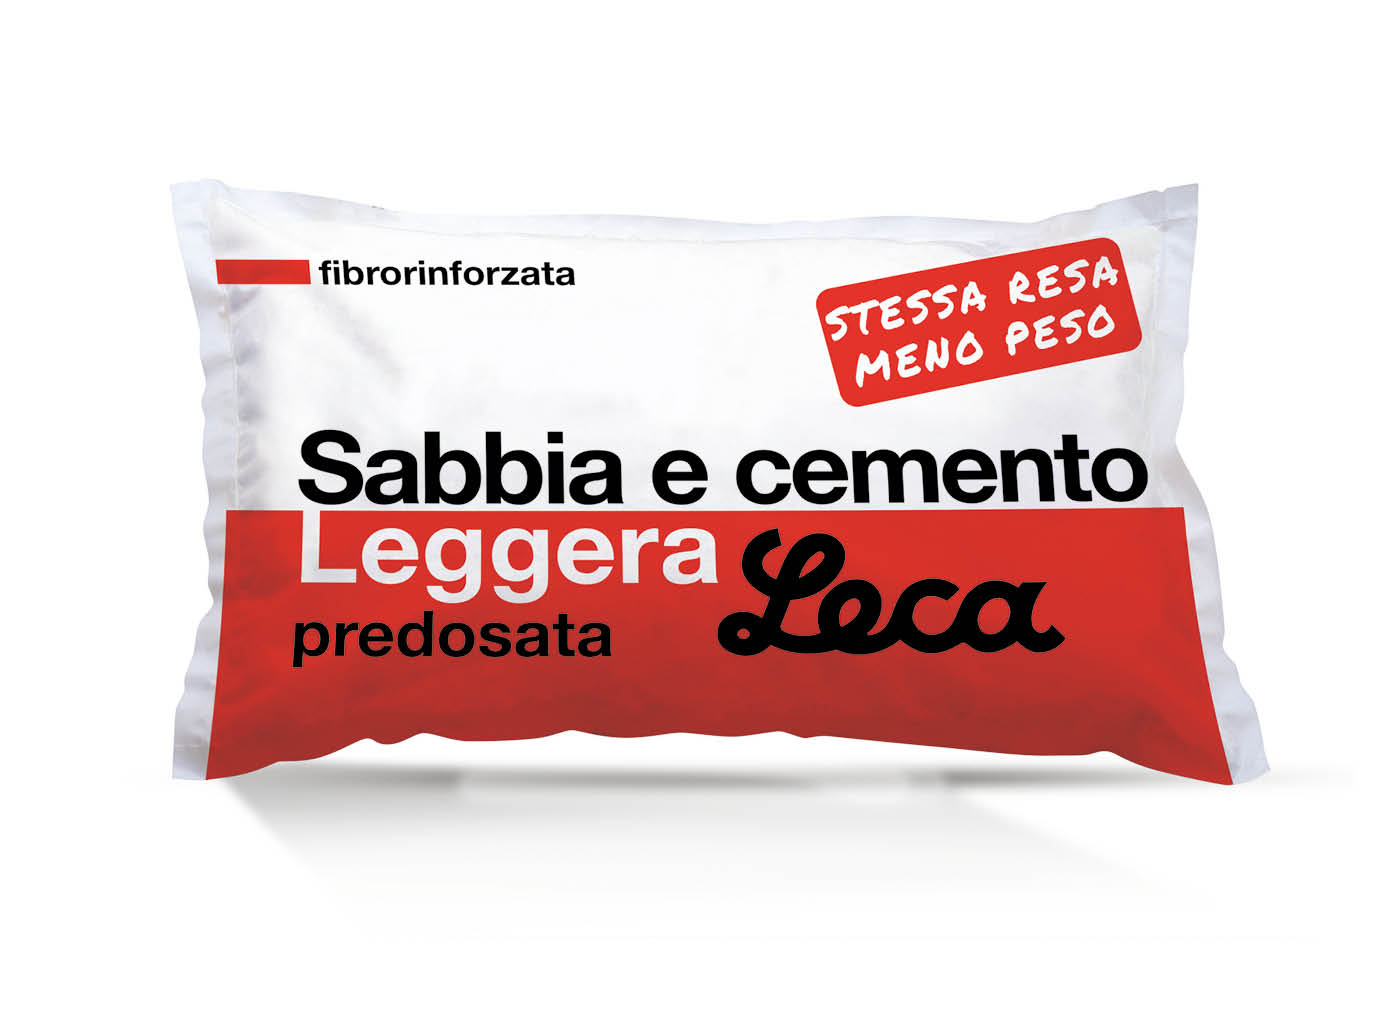 sacco-sabbia-e-cemento-leggera-predosata-P16-1